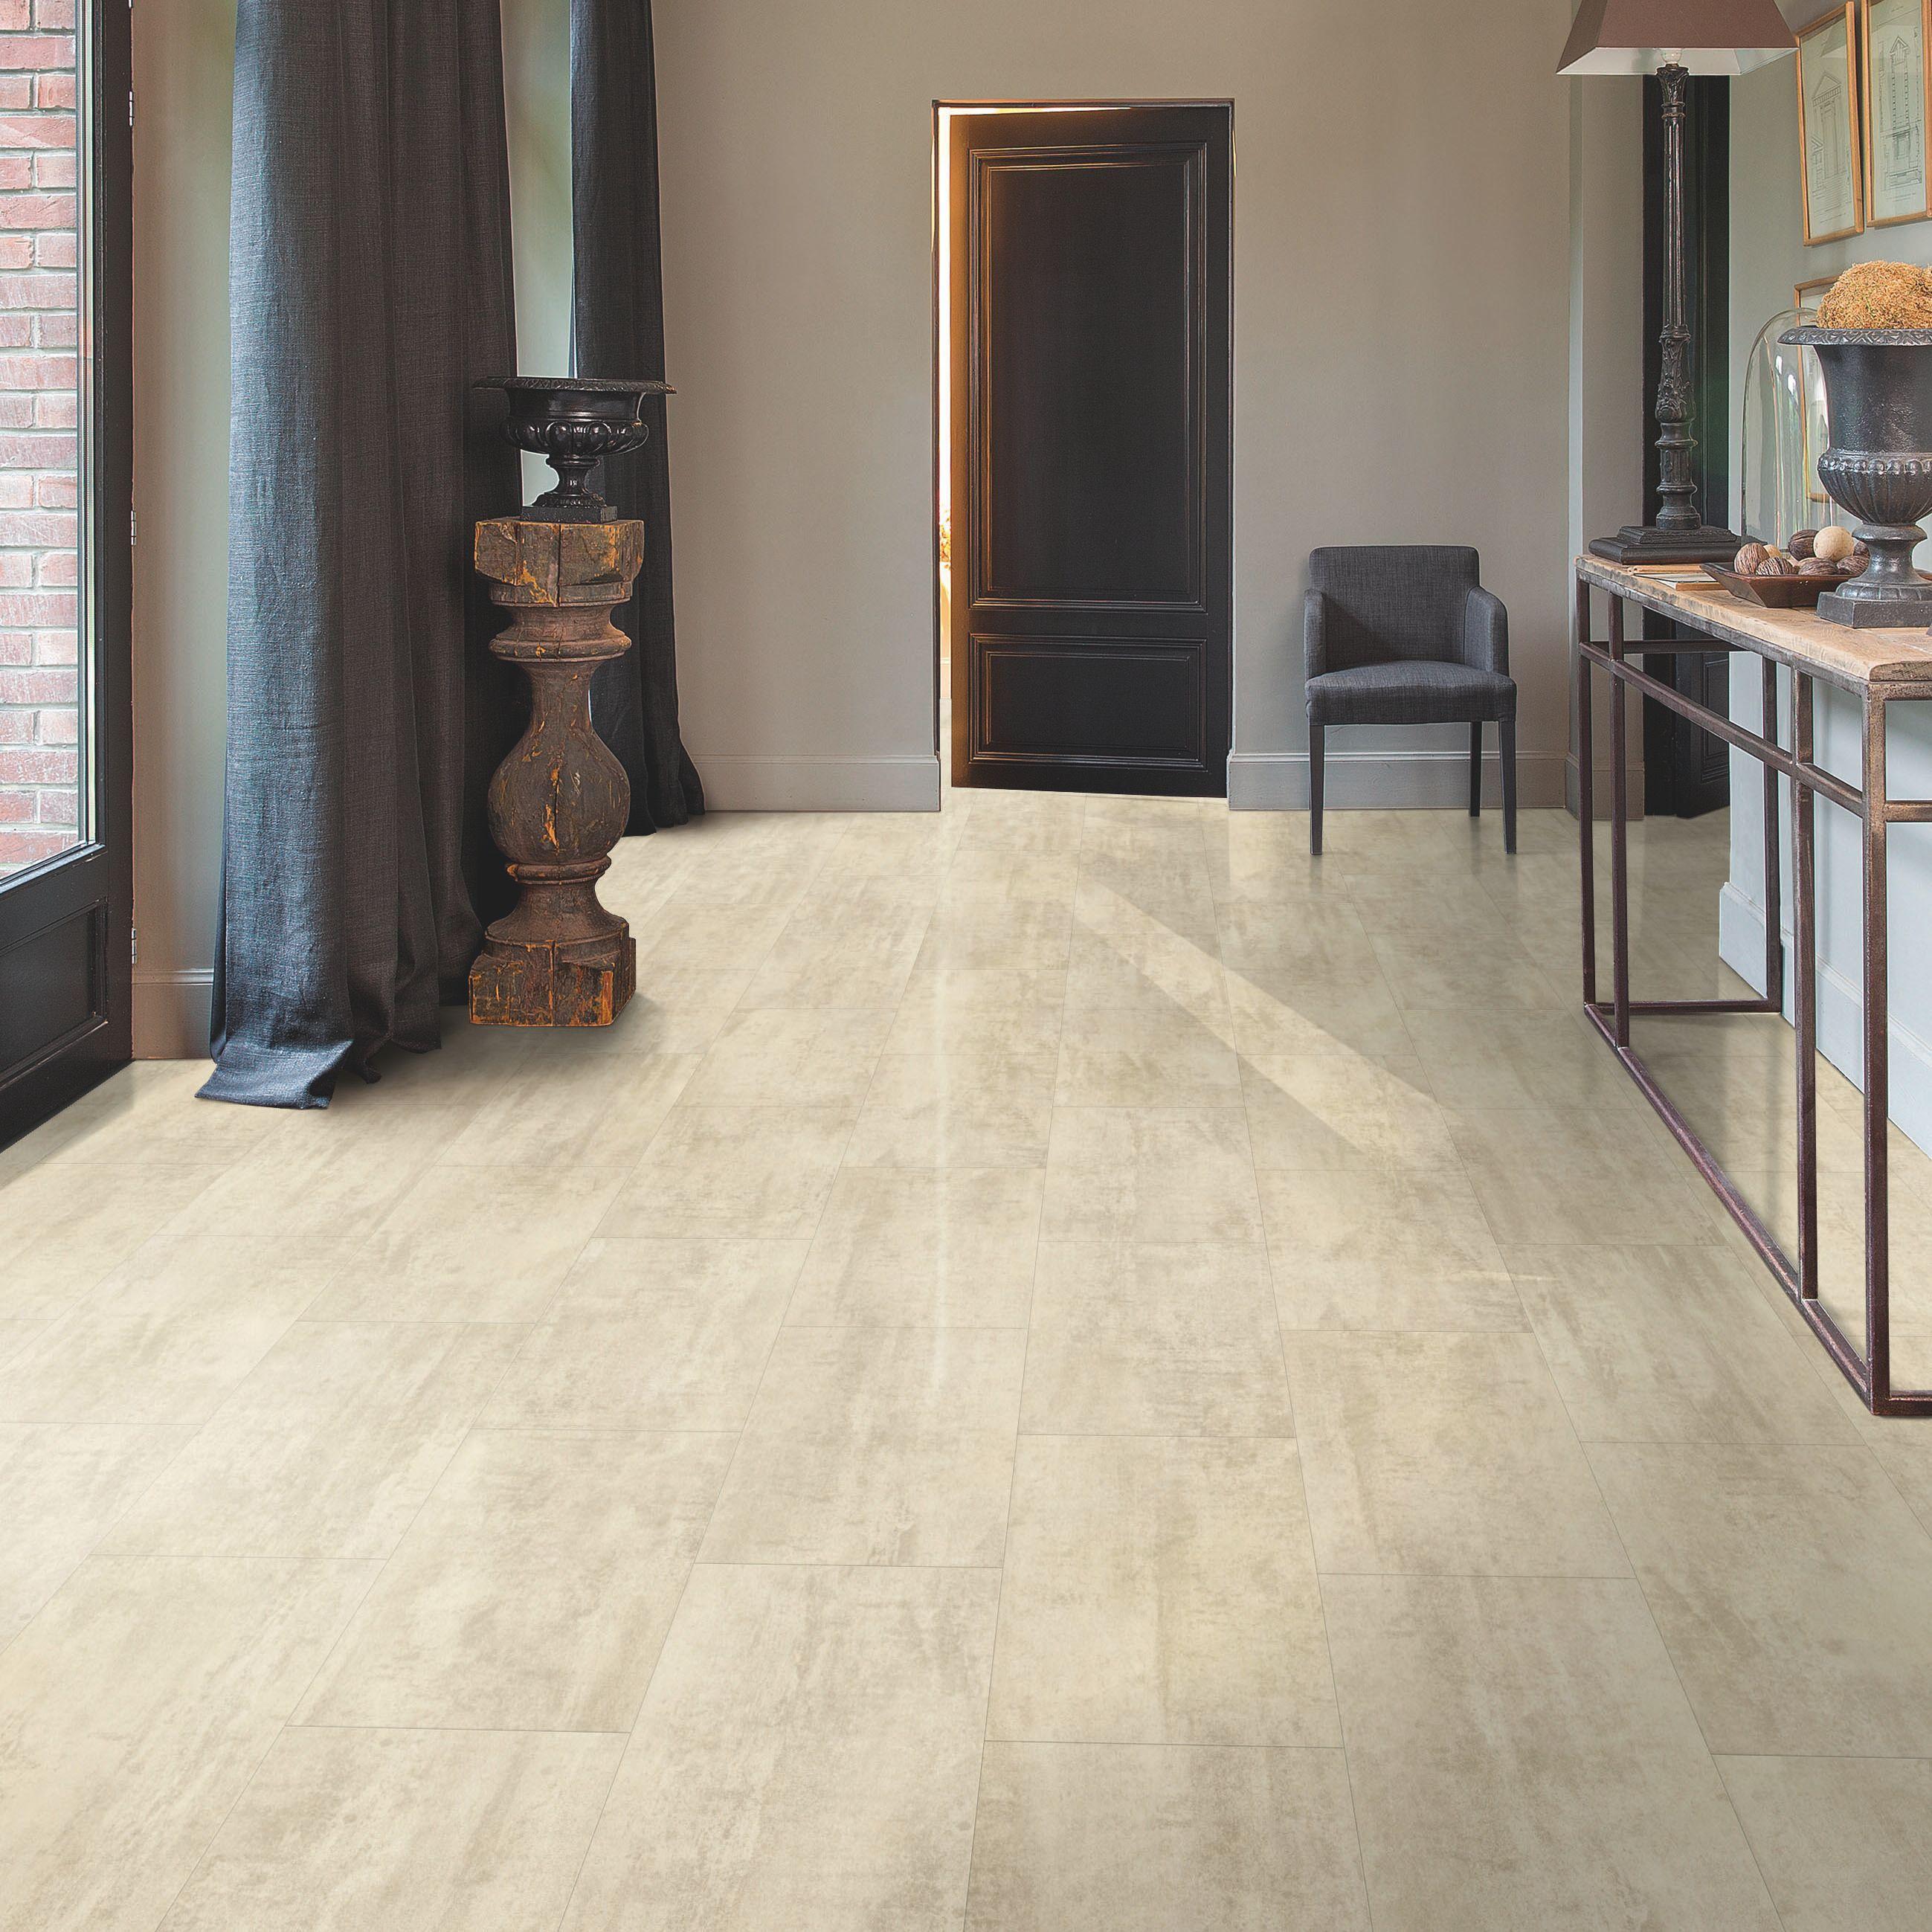 luxury kitchen appliances unfinished oak cabinets home depot quick-step lima beige travertine effect waterproof ...